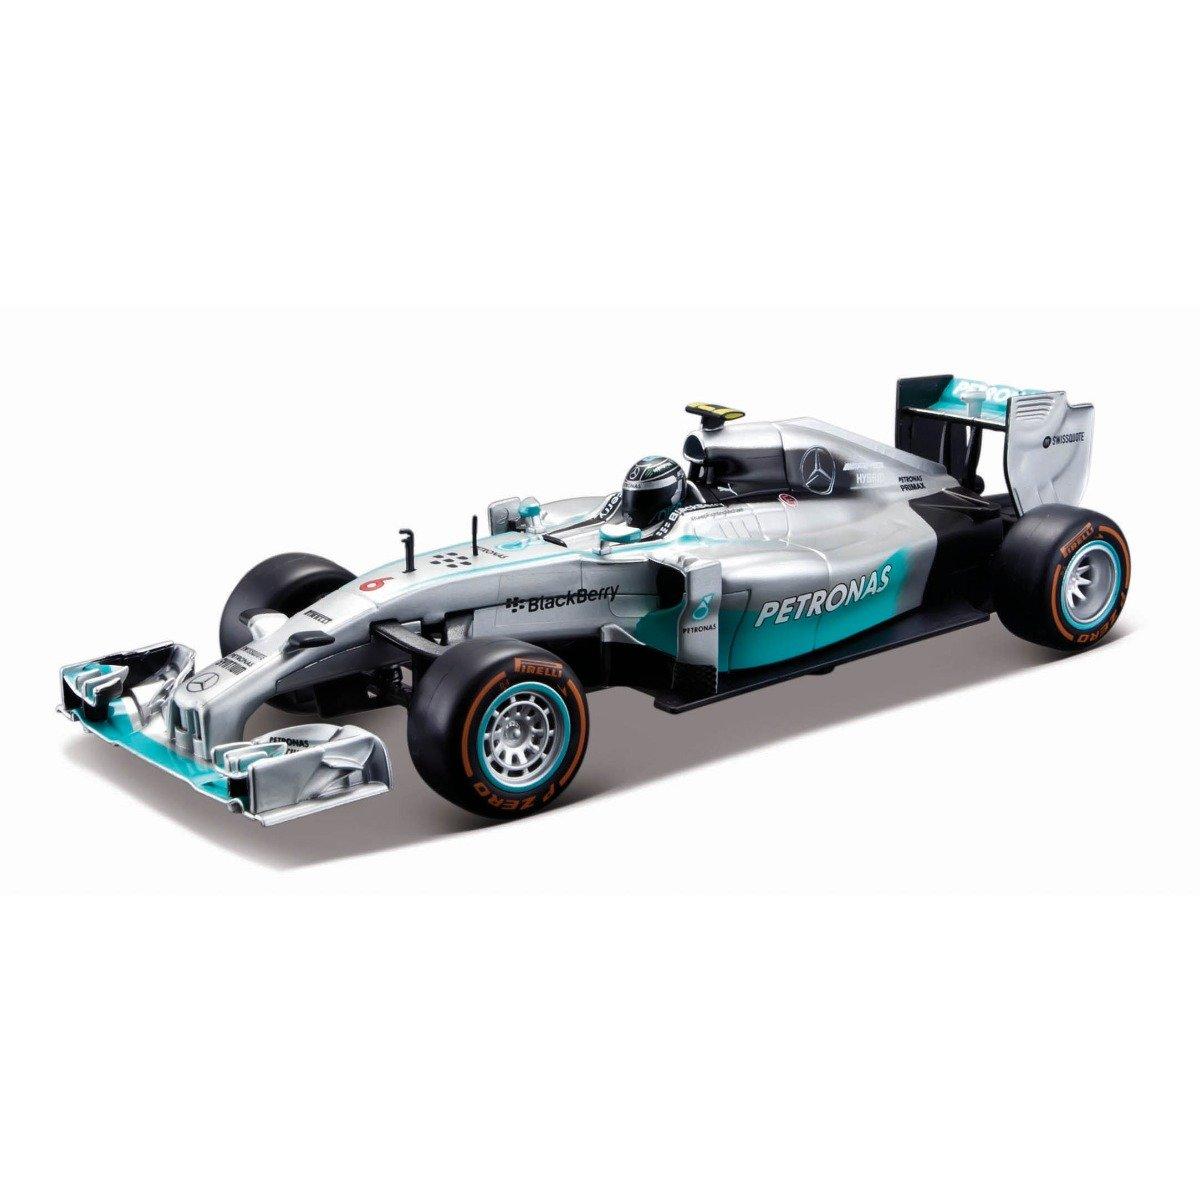 Masinuta cu telecomanda Maisto Mercedes F1W05, 1:24, 40 MHz